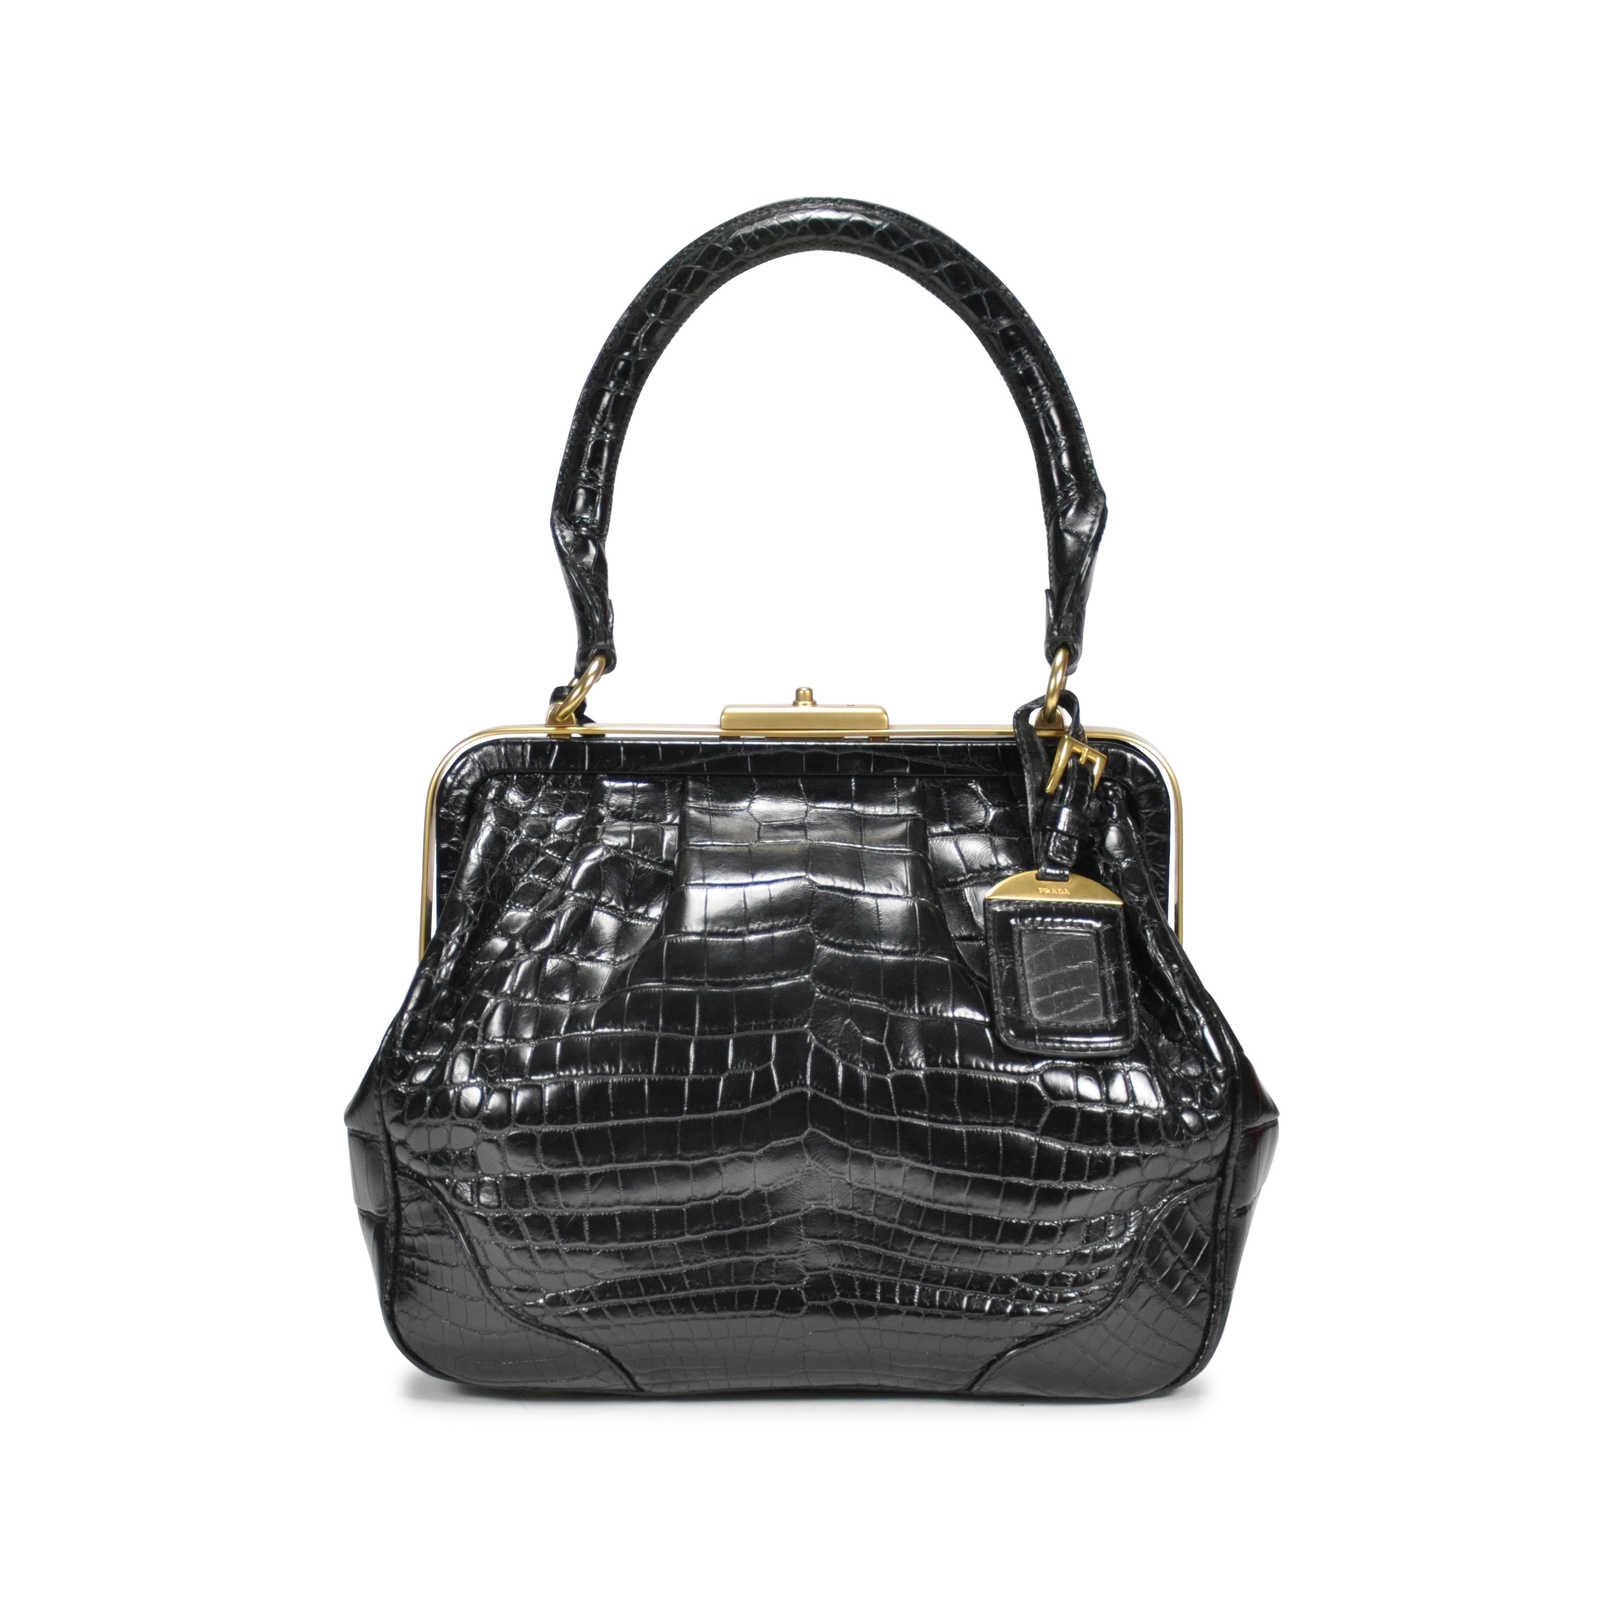 750197a8f847 ... Authentic Second Hand Prada Crocodile Top Handle Frame Bag  (PSS-145-00076) ...